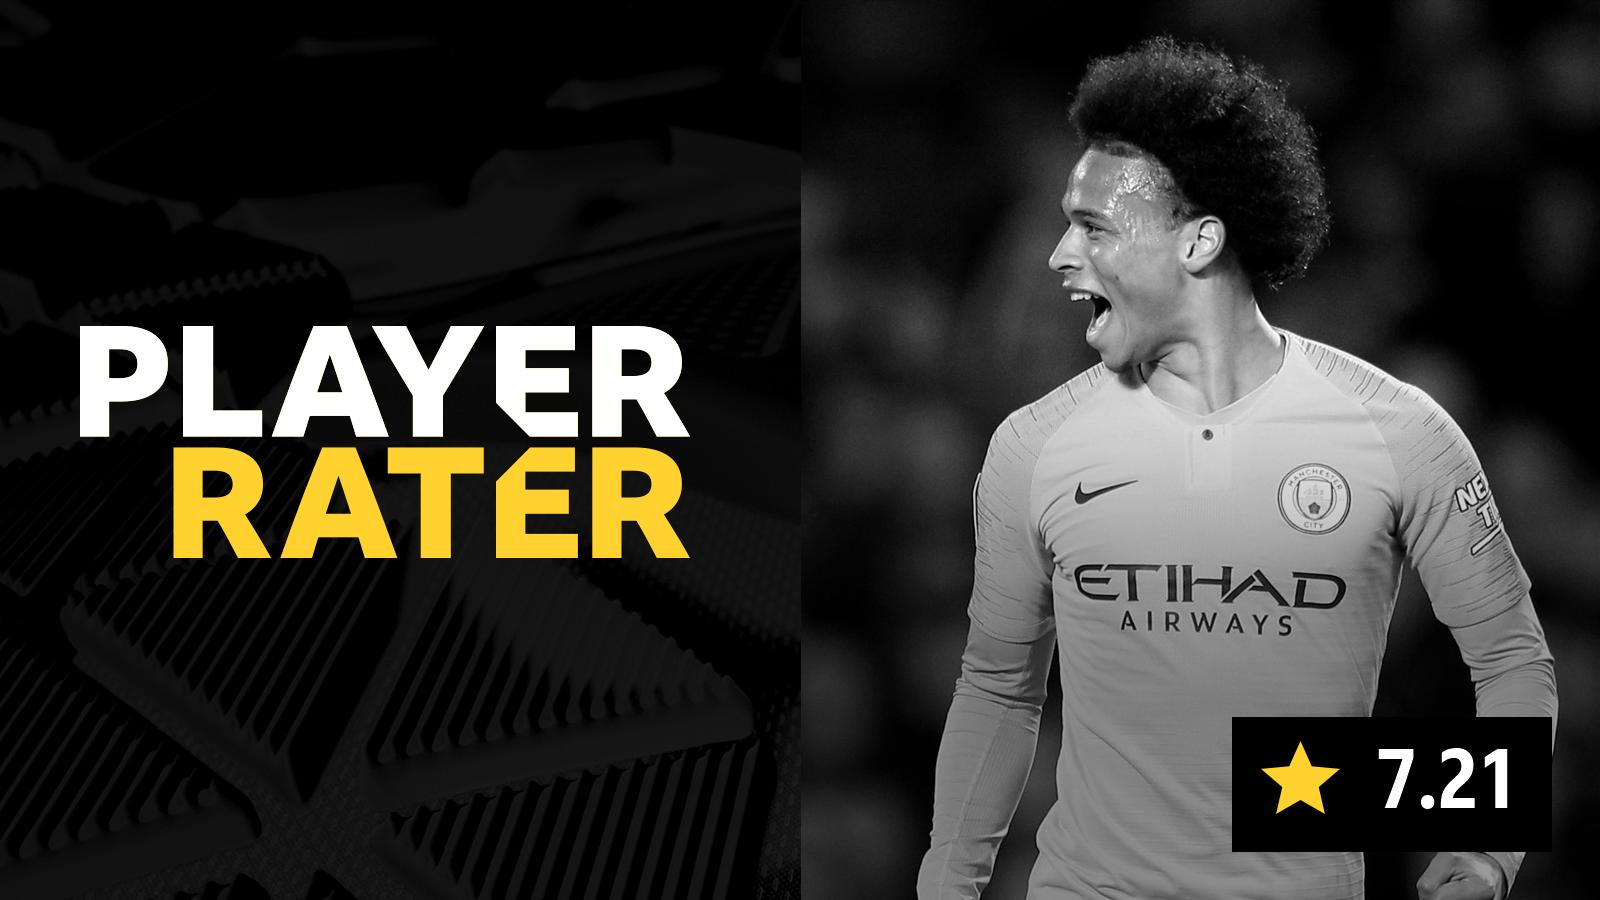 Man Utd 0-2 Man City: Leroy Sane tops ratings